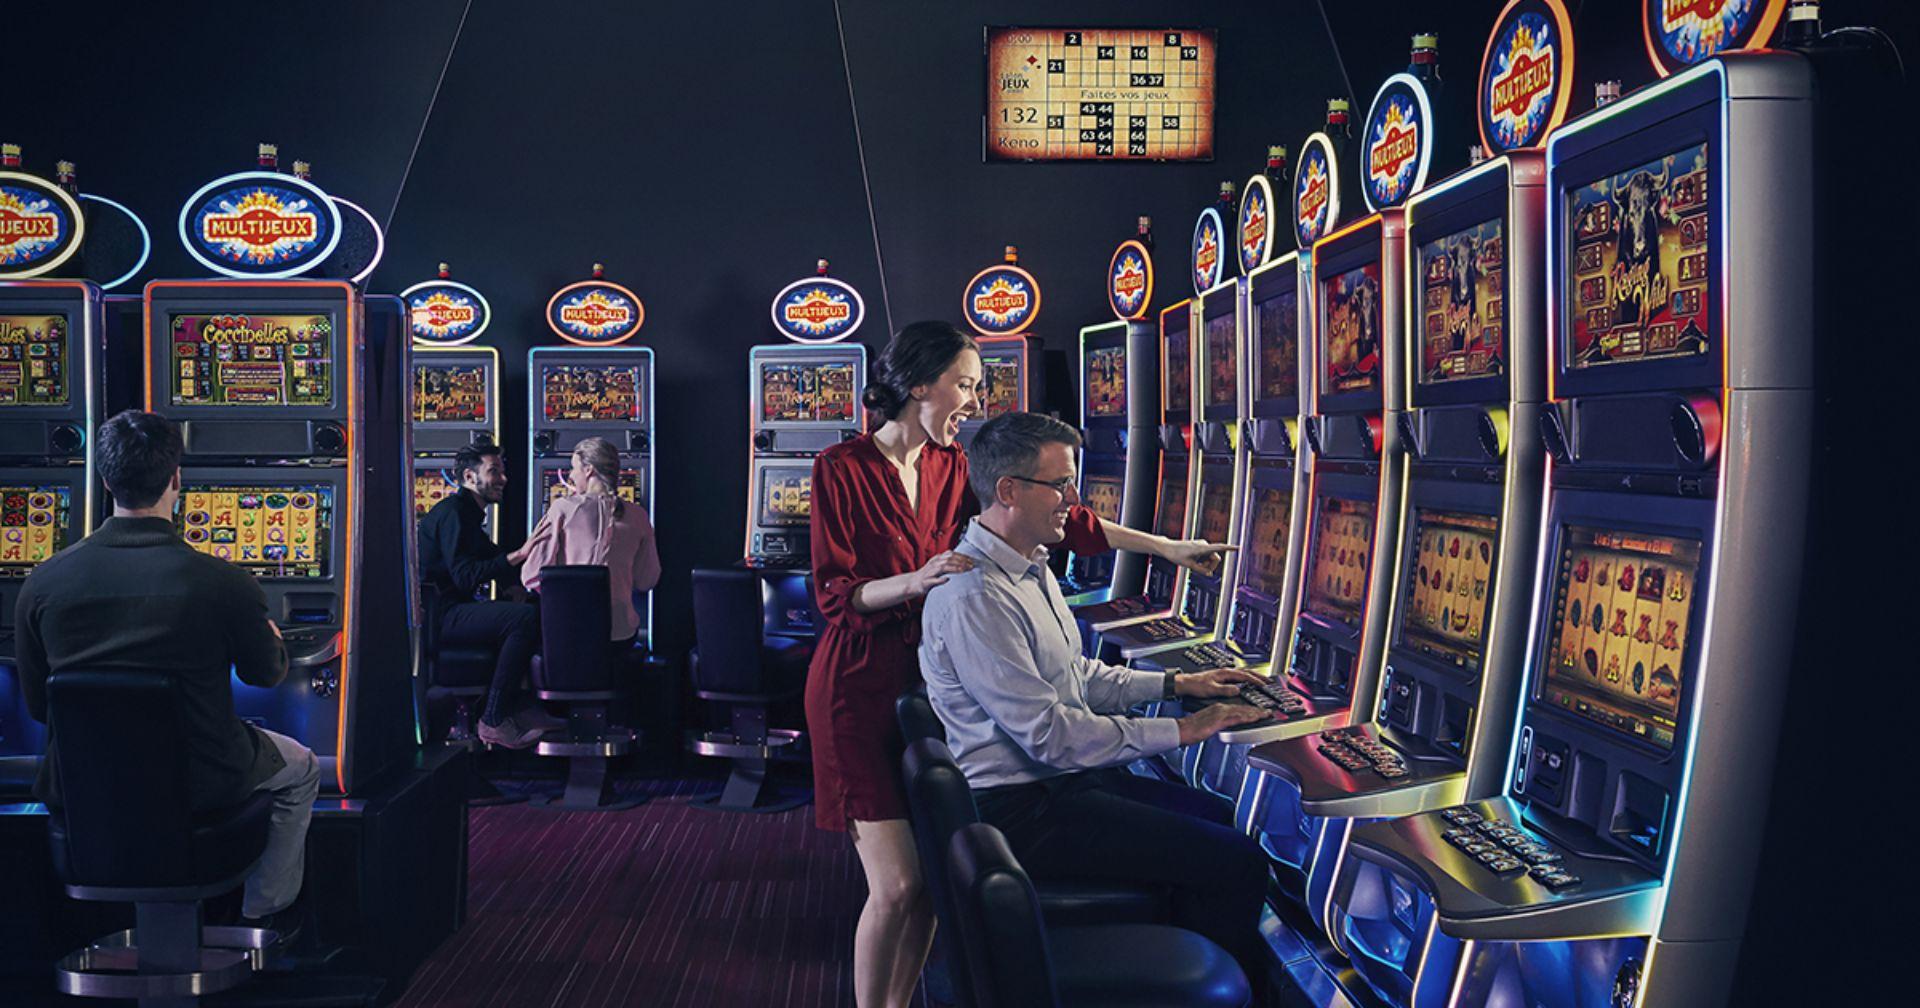 Игровые автоматы онлайн без денег